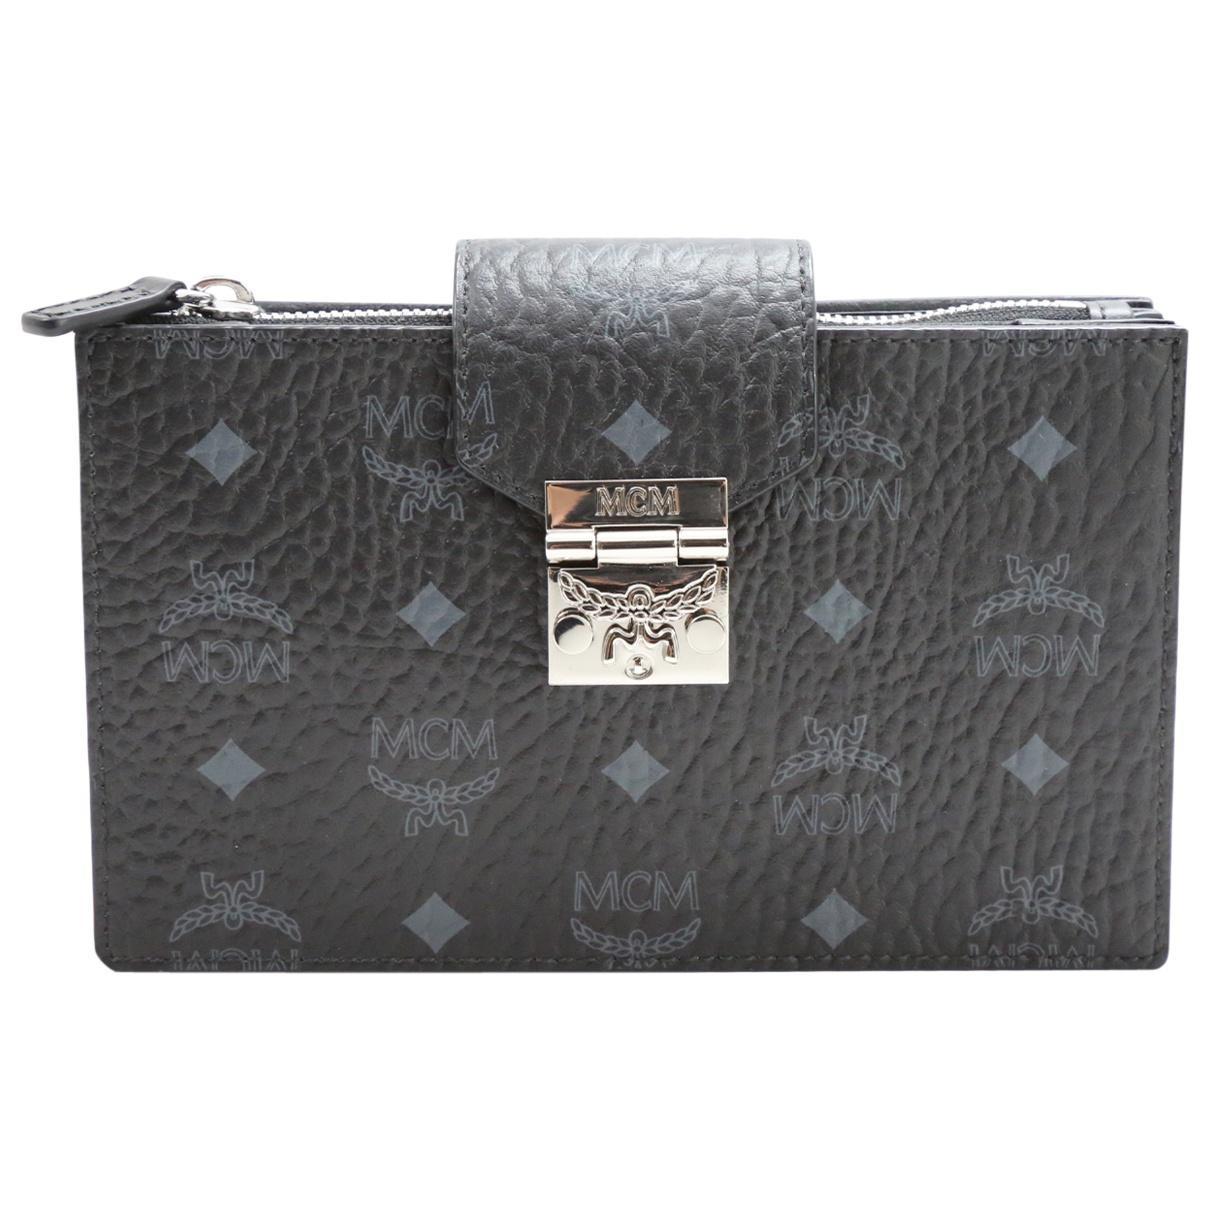 Pre-owned - Leather clutch bag MCM XdPU5Q